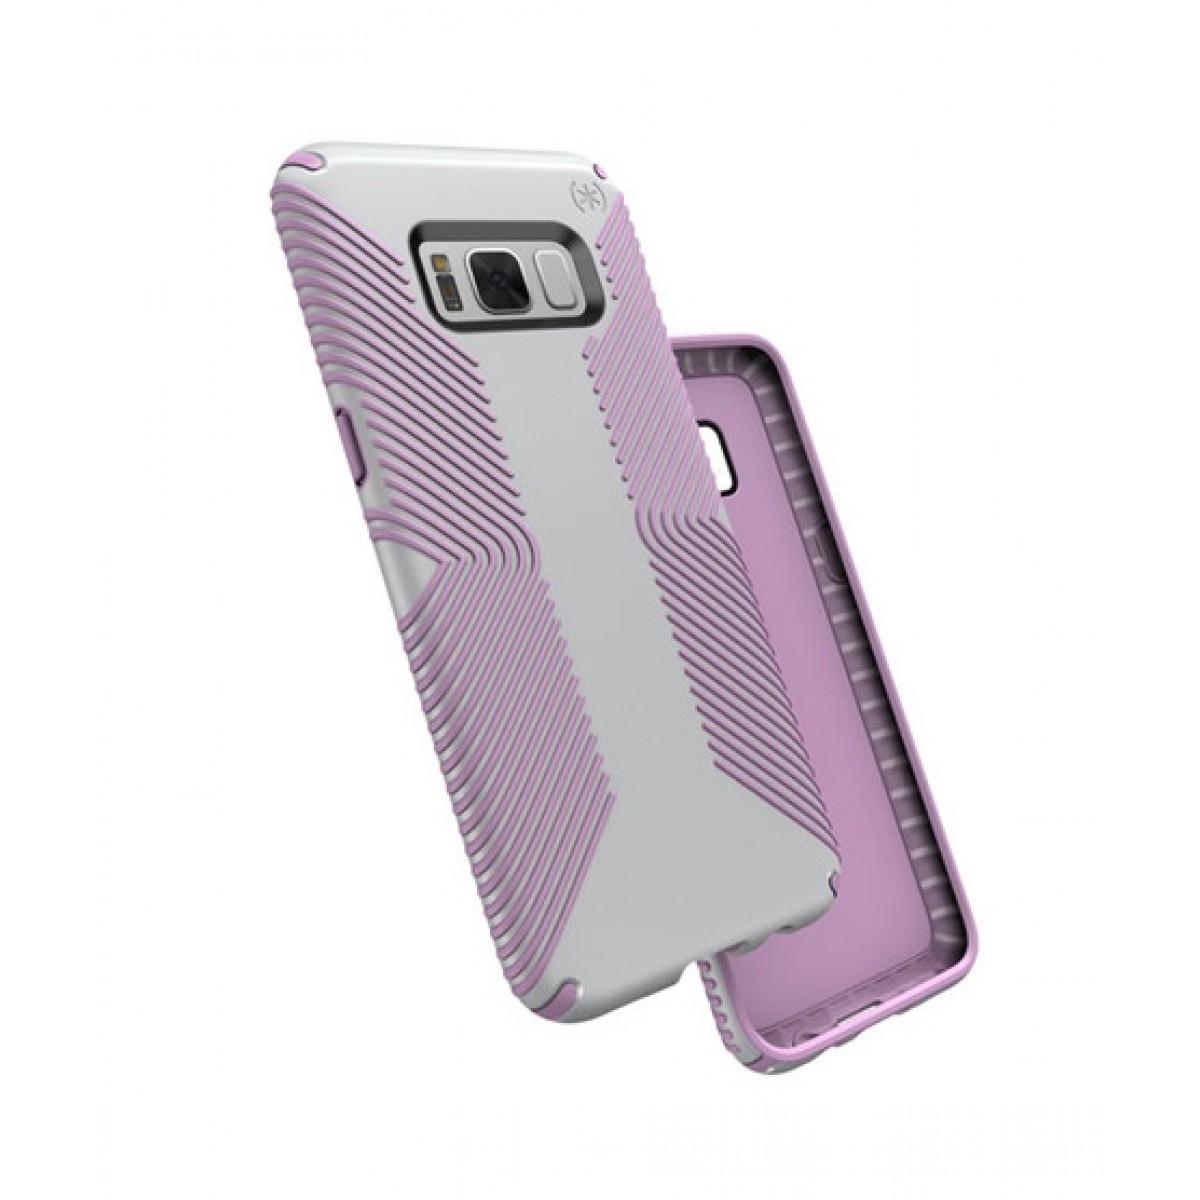 new style f3e8c 620fc Speck Presidio Grip Dolphin Grey/Bellflower Purple Case For Galaxy S8